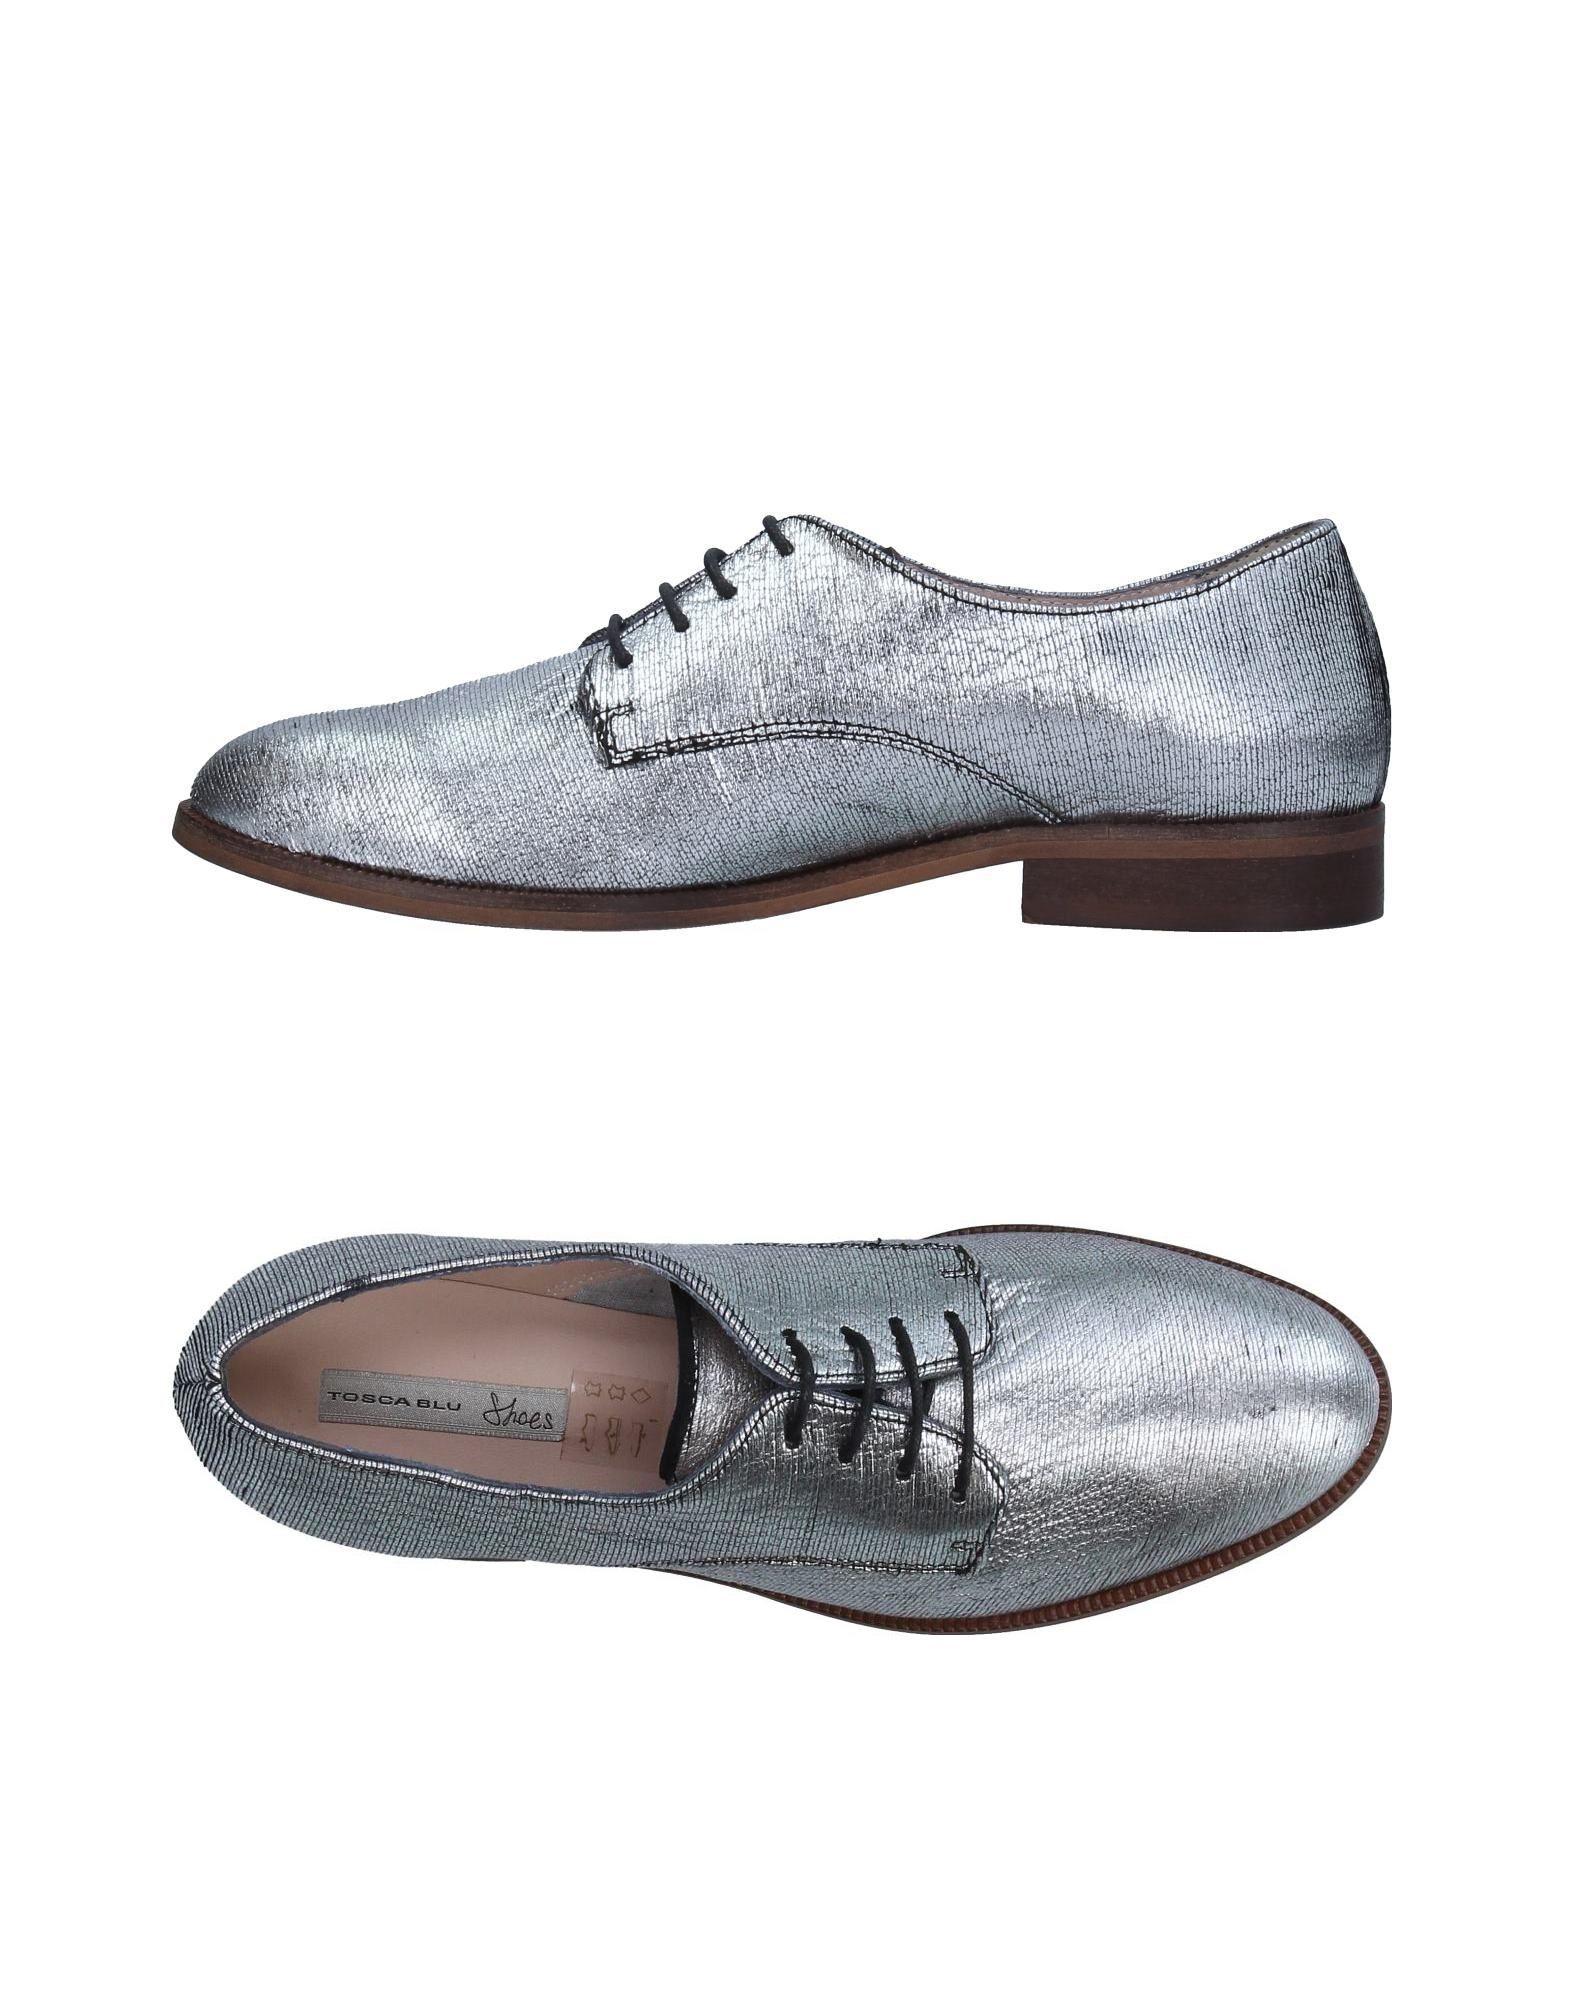 Tosca Blu Shoes Schnürschuhe Damen  11326377NL Neue Schuhe